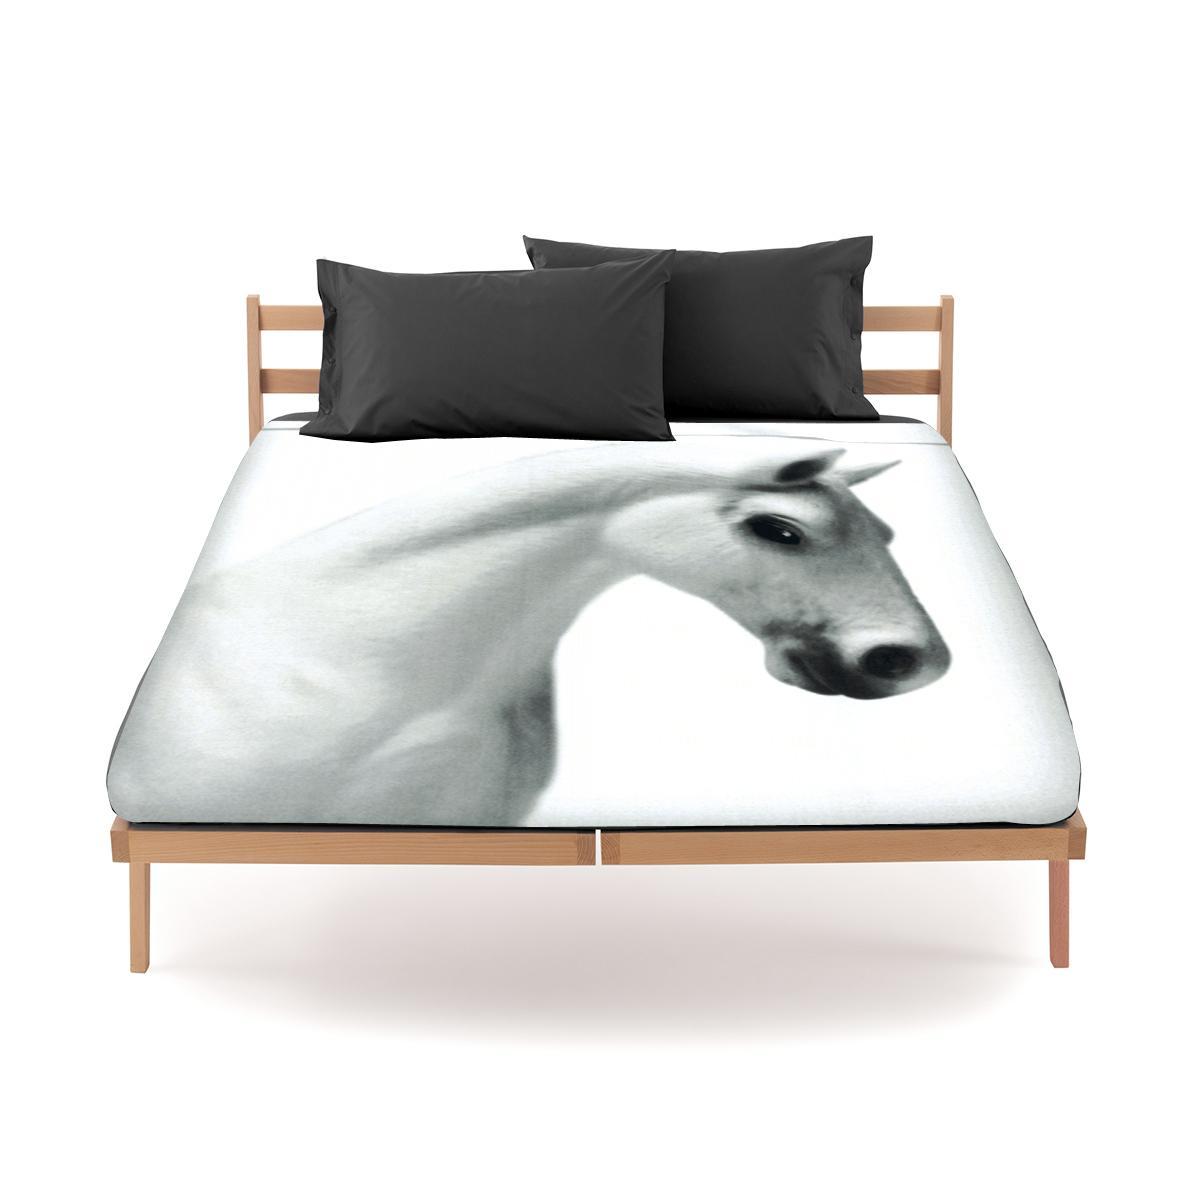 Set lenzuola bassetti by gardone per letto matrimoniale fondo bianco cavallo - Set letto matrimoniale ...